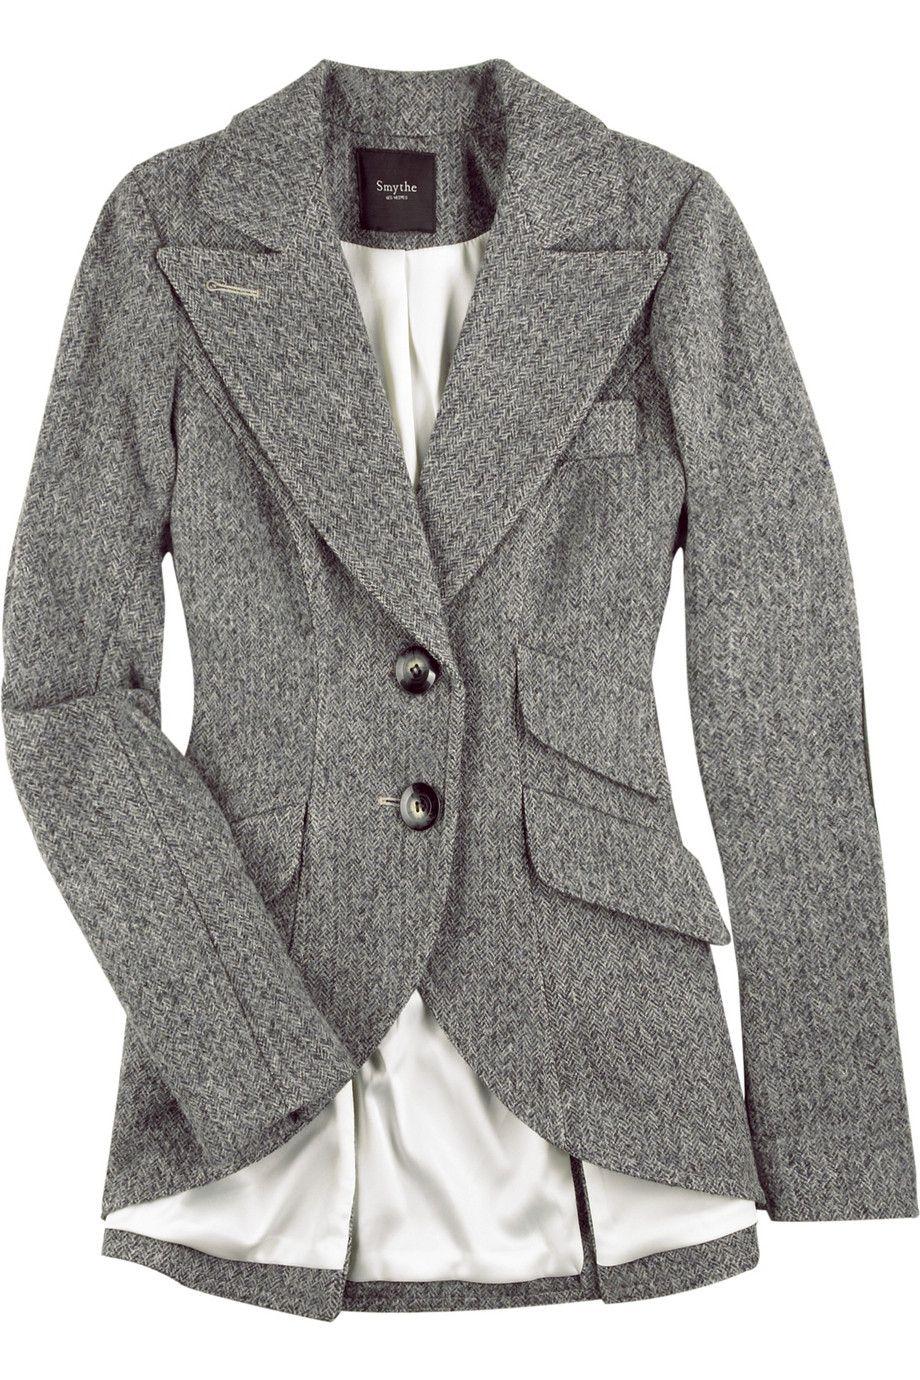 Smythe Herringbone Equestrian Jacket Net A Porter Com Stylehive Fashion Smythe Blazer Clothes [ 1380 x 920 Pixel ]